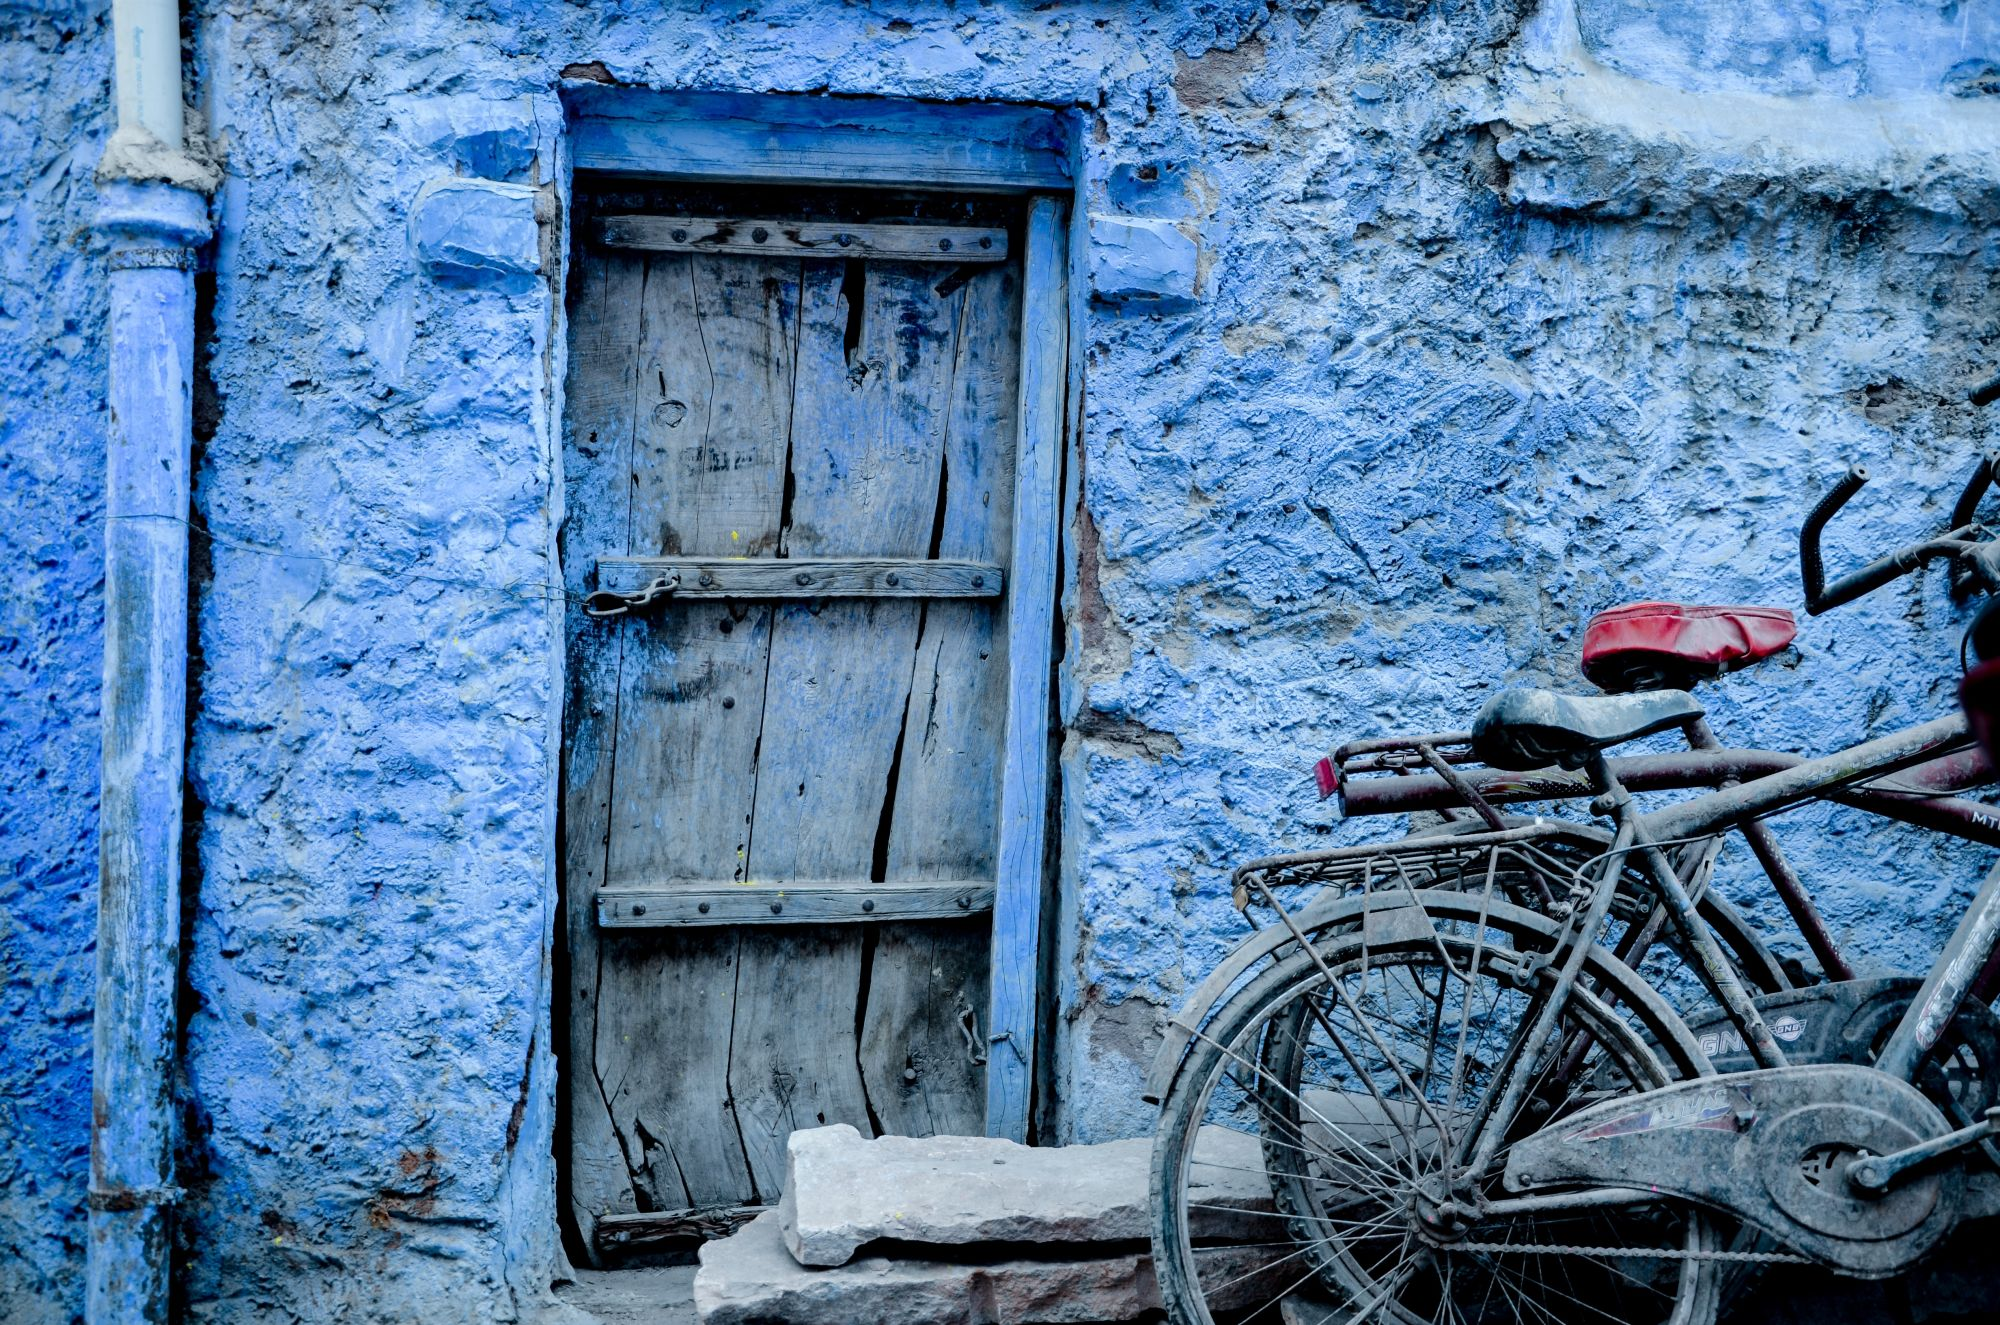 Southeast Asia Grand Journey Tours 2019 - 2020 -  jodhpur blue wall bikes